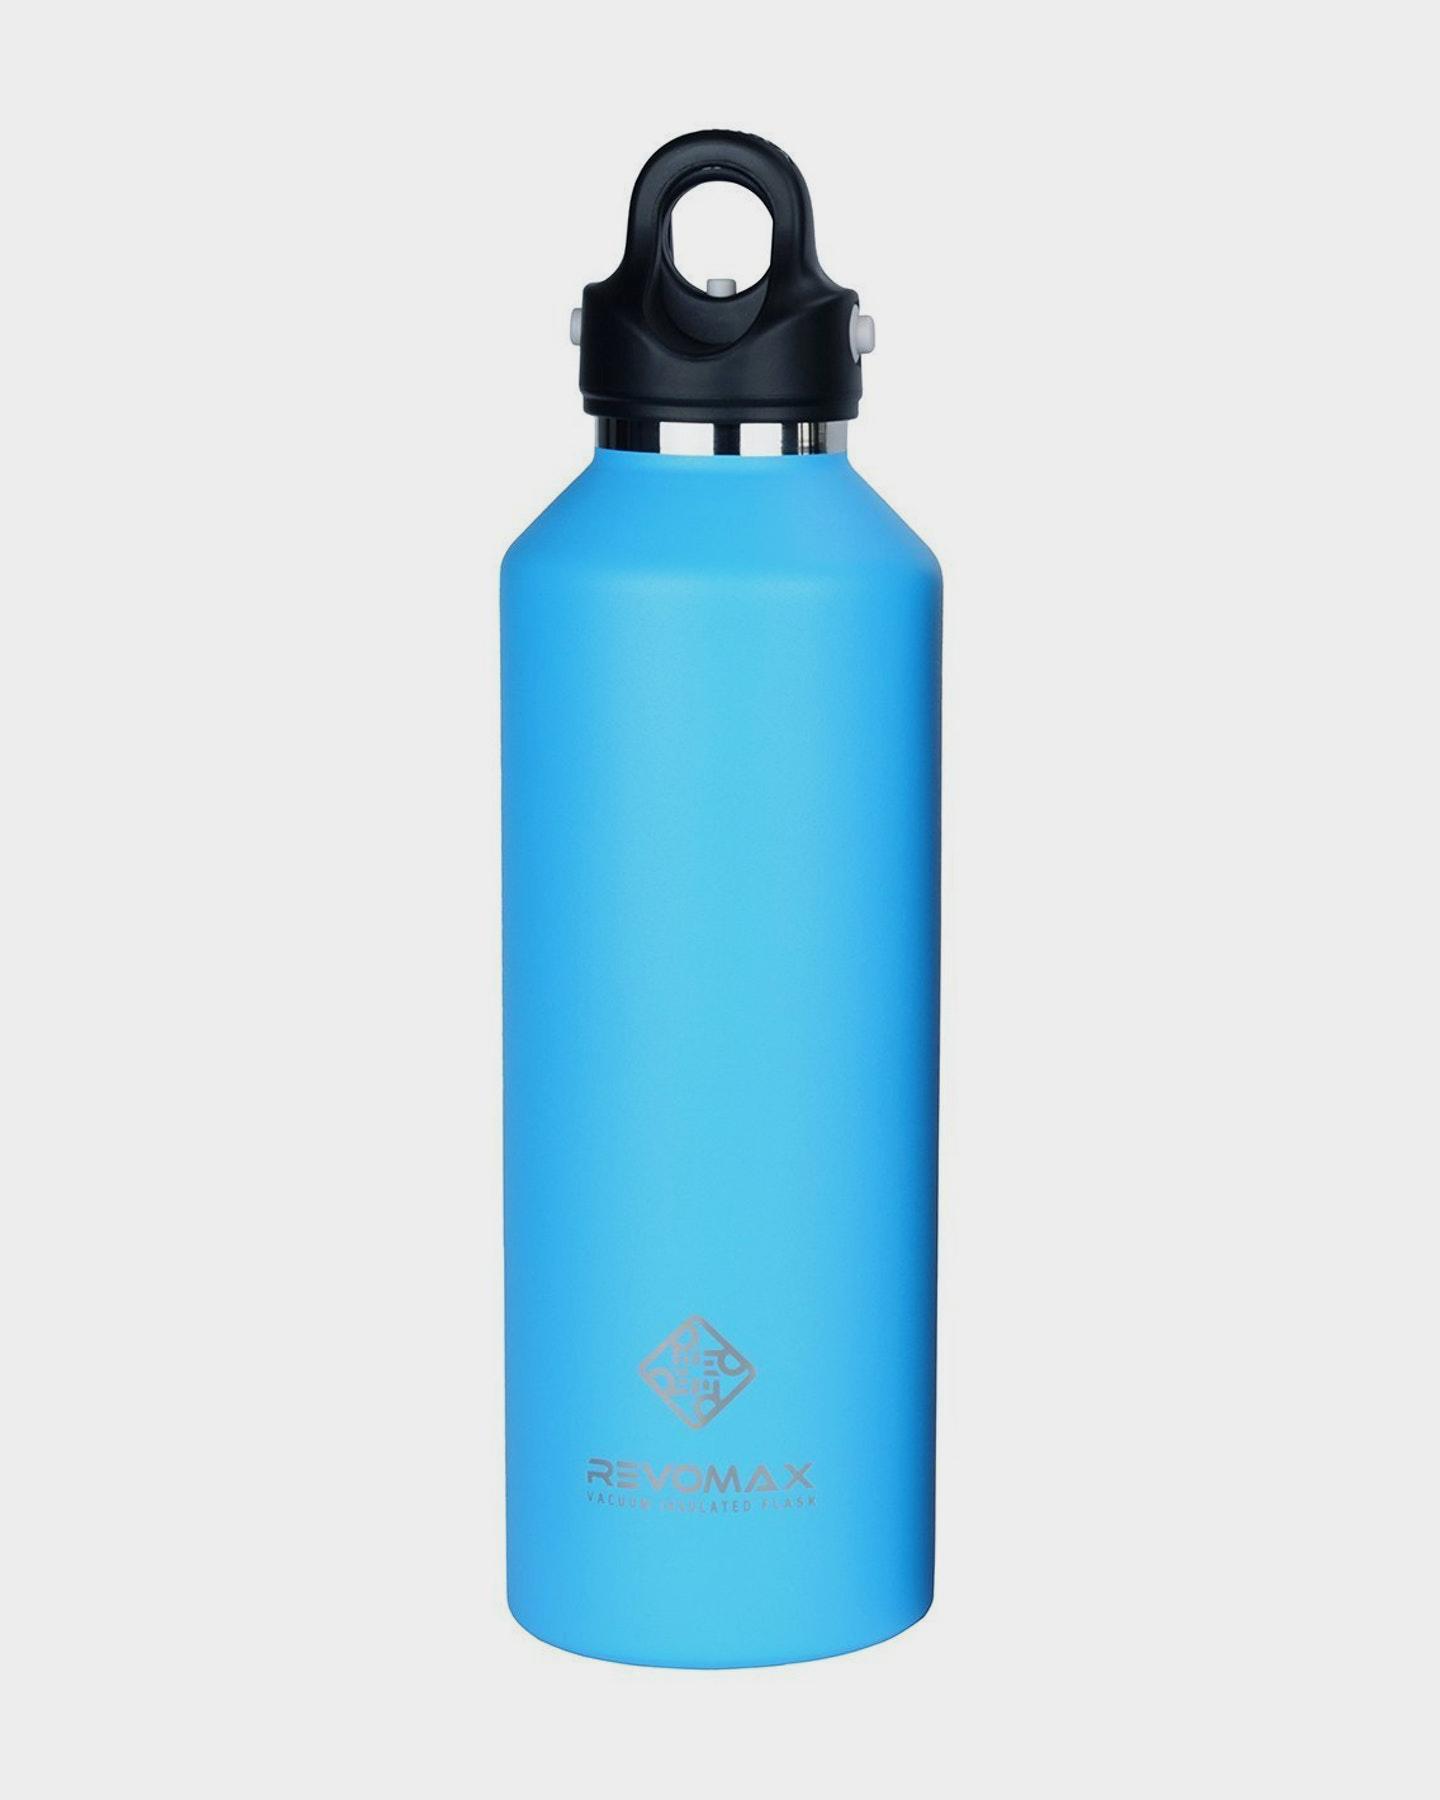 Revomax 950Ml - 32Oz Insulated Flask Drink Bottle Light Blue